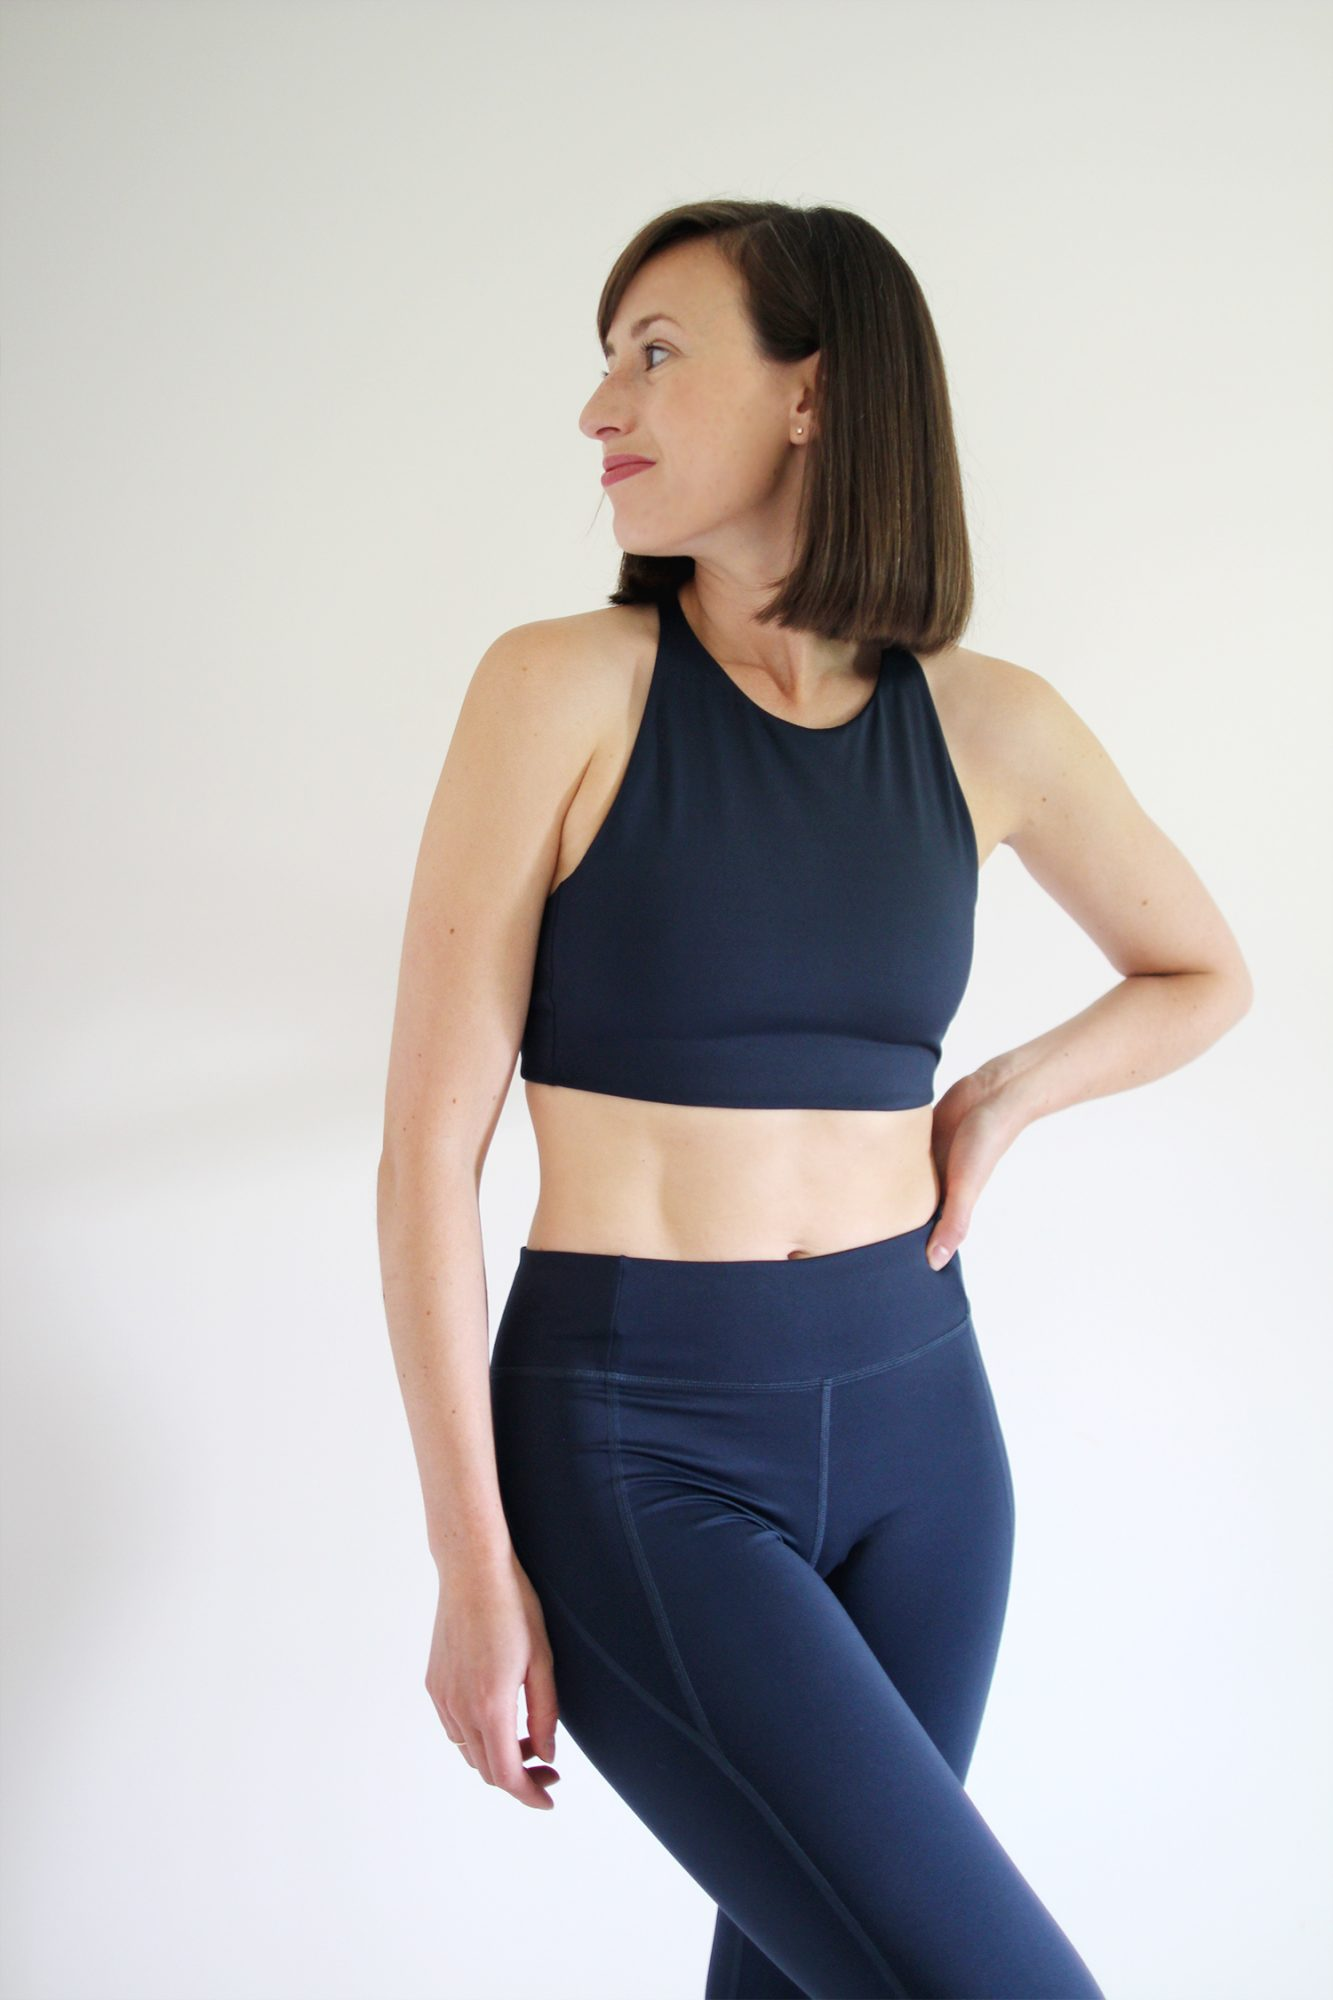 Style Bee - Summer 10x10 - Activewear Edition - Look 1